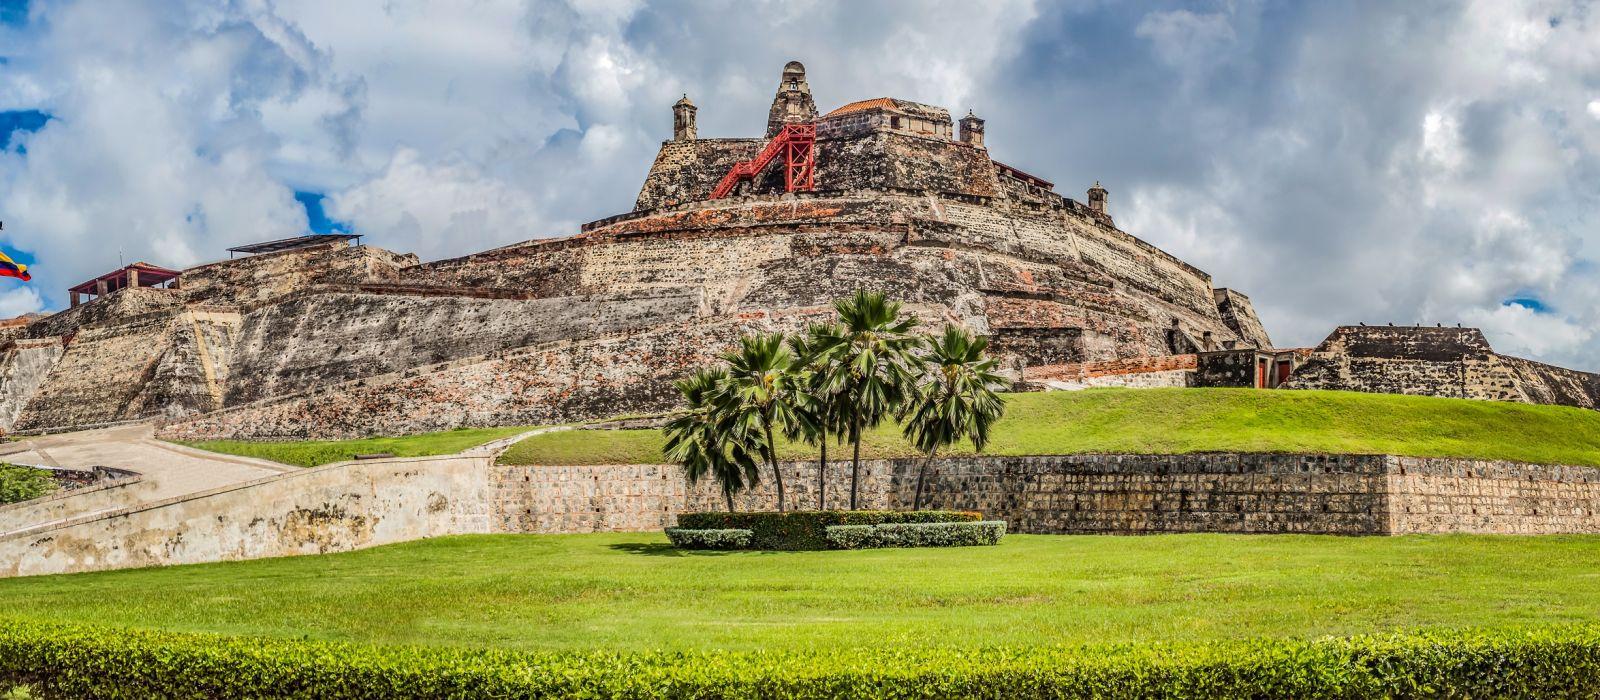 Kolumbien: Cartagena, Kaffeeregion & Isla Baru Urlaub 3